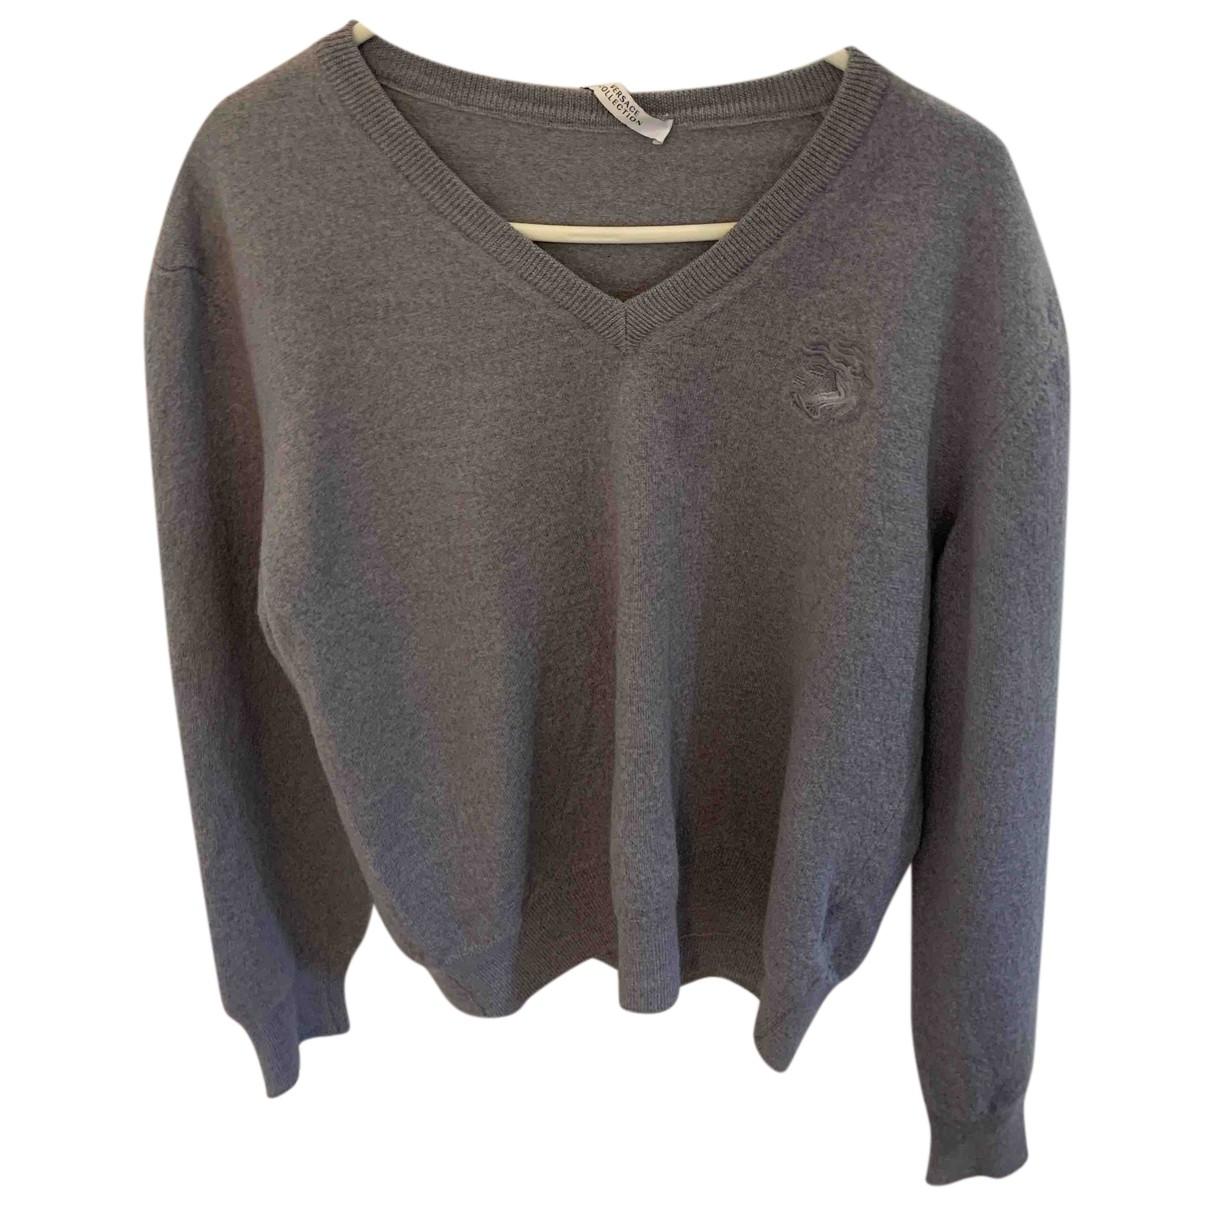 Gianni Versace N Grey Wool Knitwear for Kids 12 years - XS UK